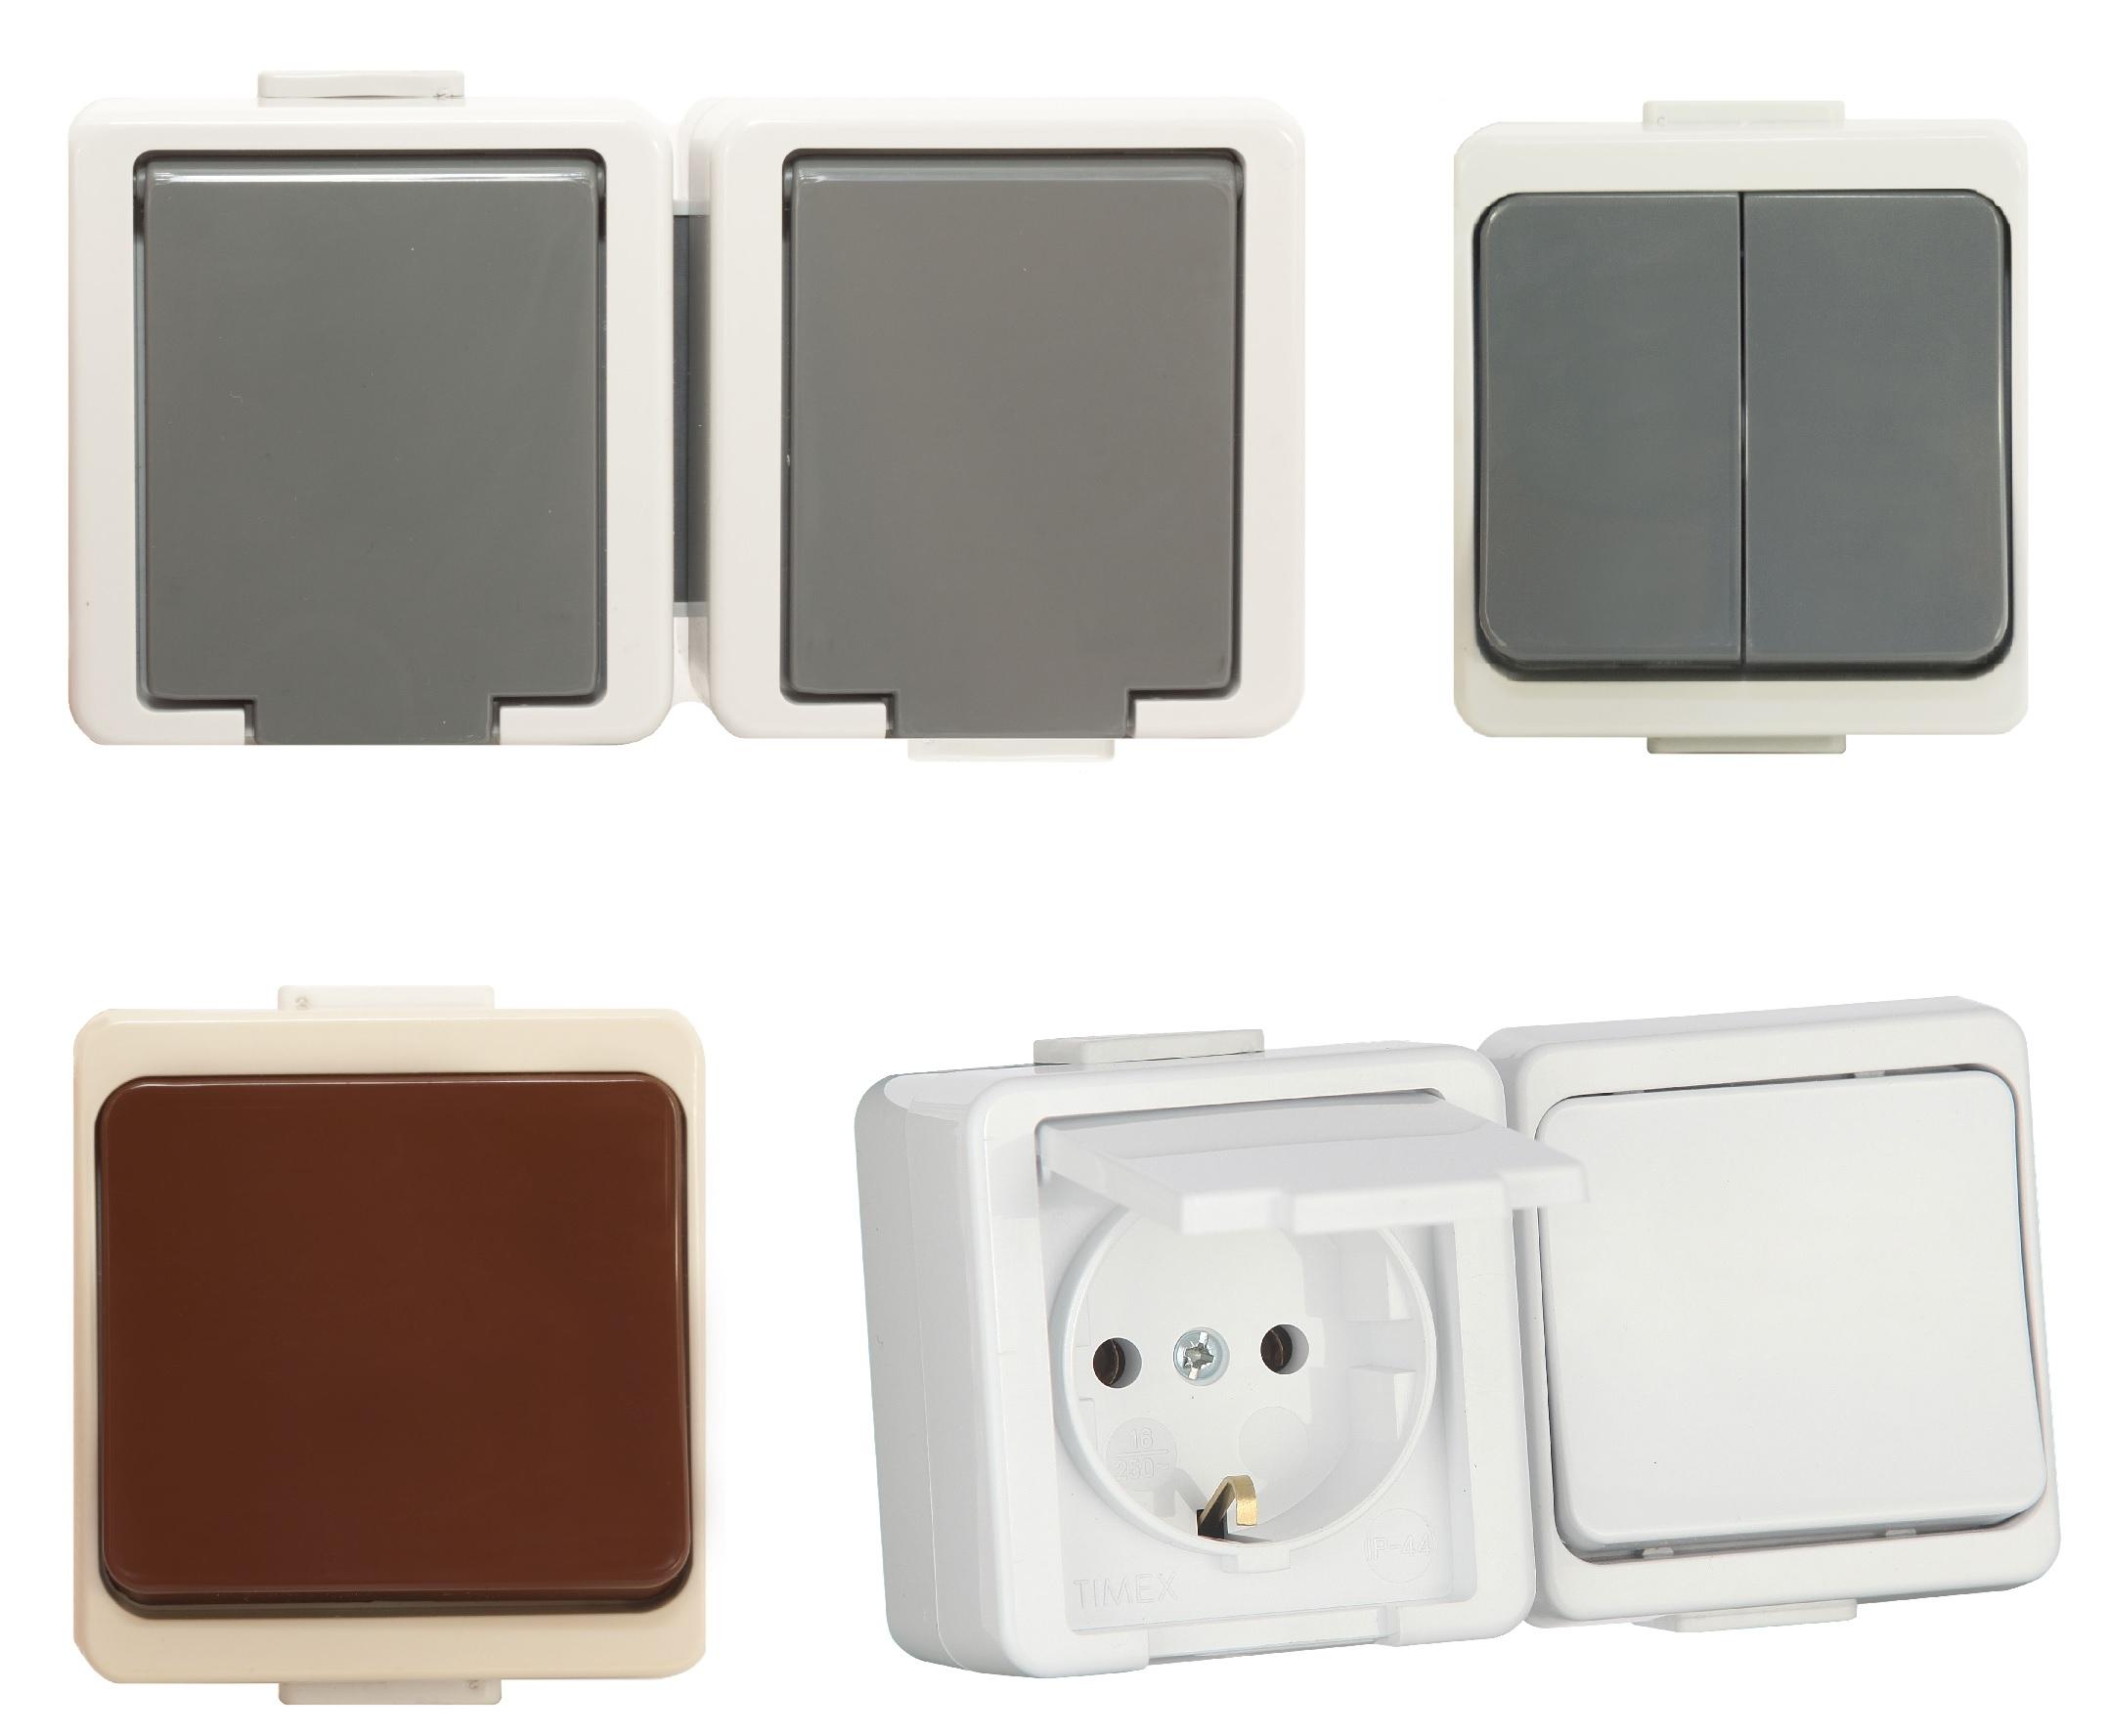 aufputzsteckdose ip44 16a 250v aufputz feuchtraum steckdose 1 fach 2 fach ap ebay. Black Bedroom Furniture Sets. Home Design Ideas